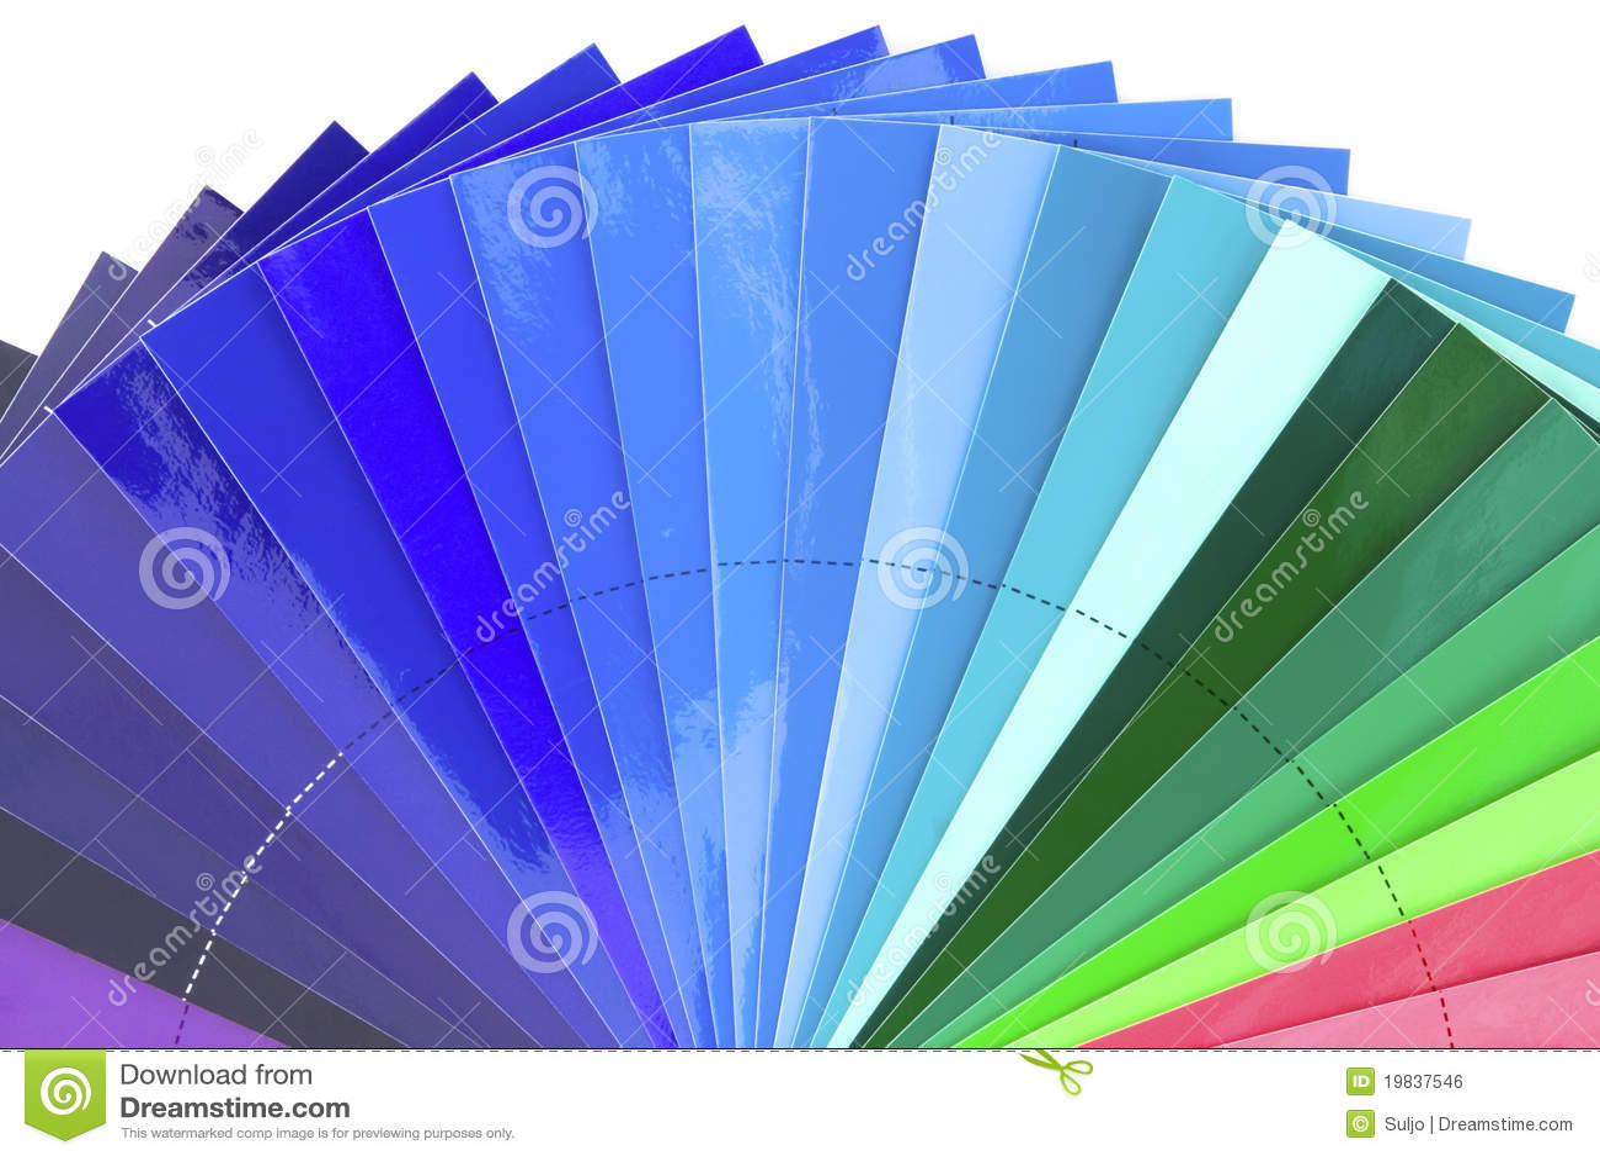 Tonos azules del color imagen de archivo libre de regal as - Tonos azules ...